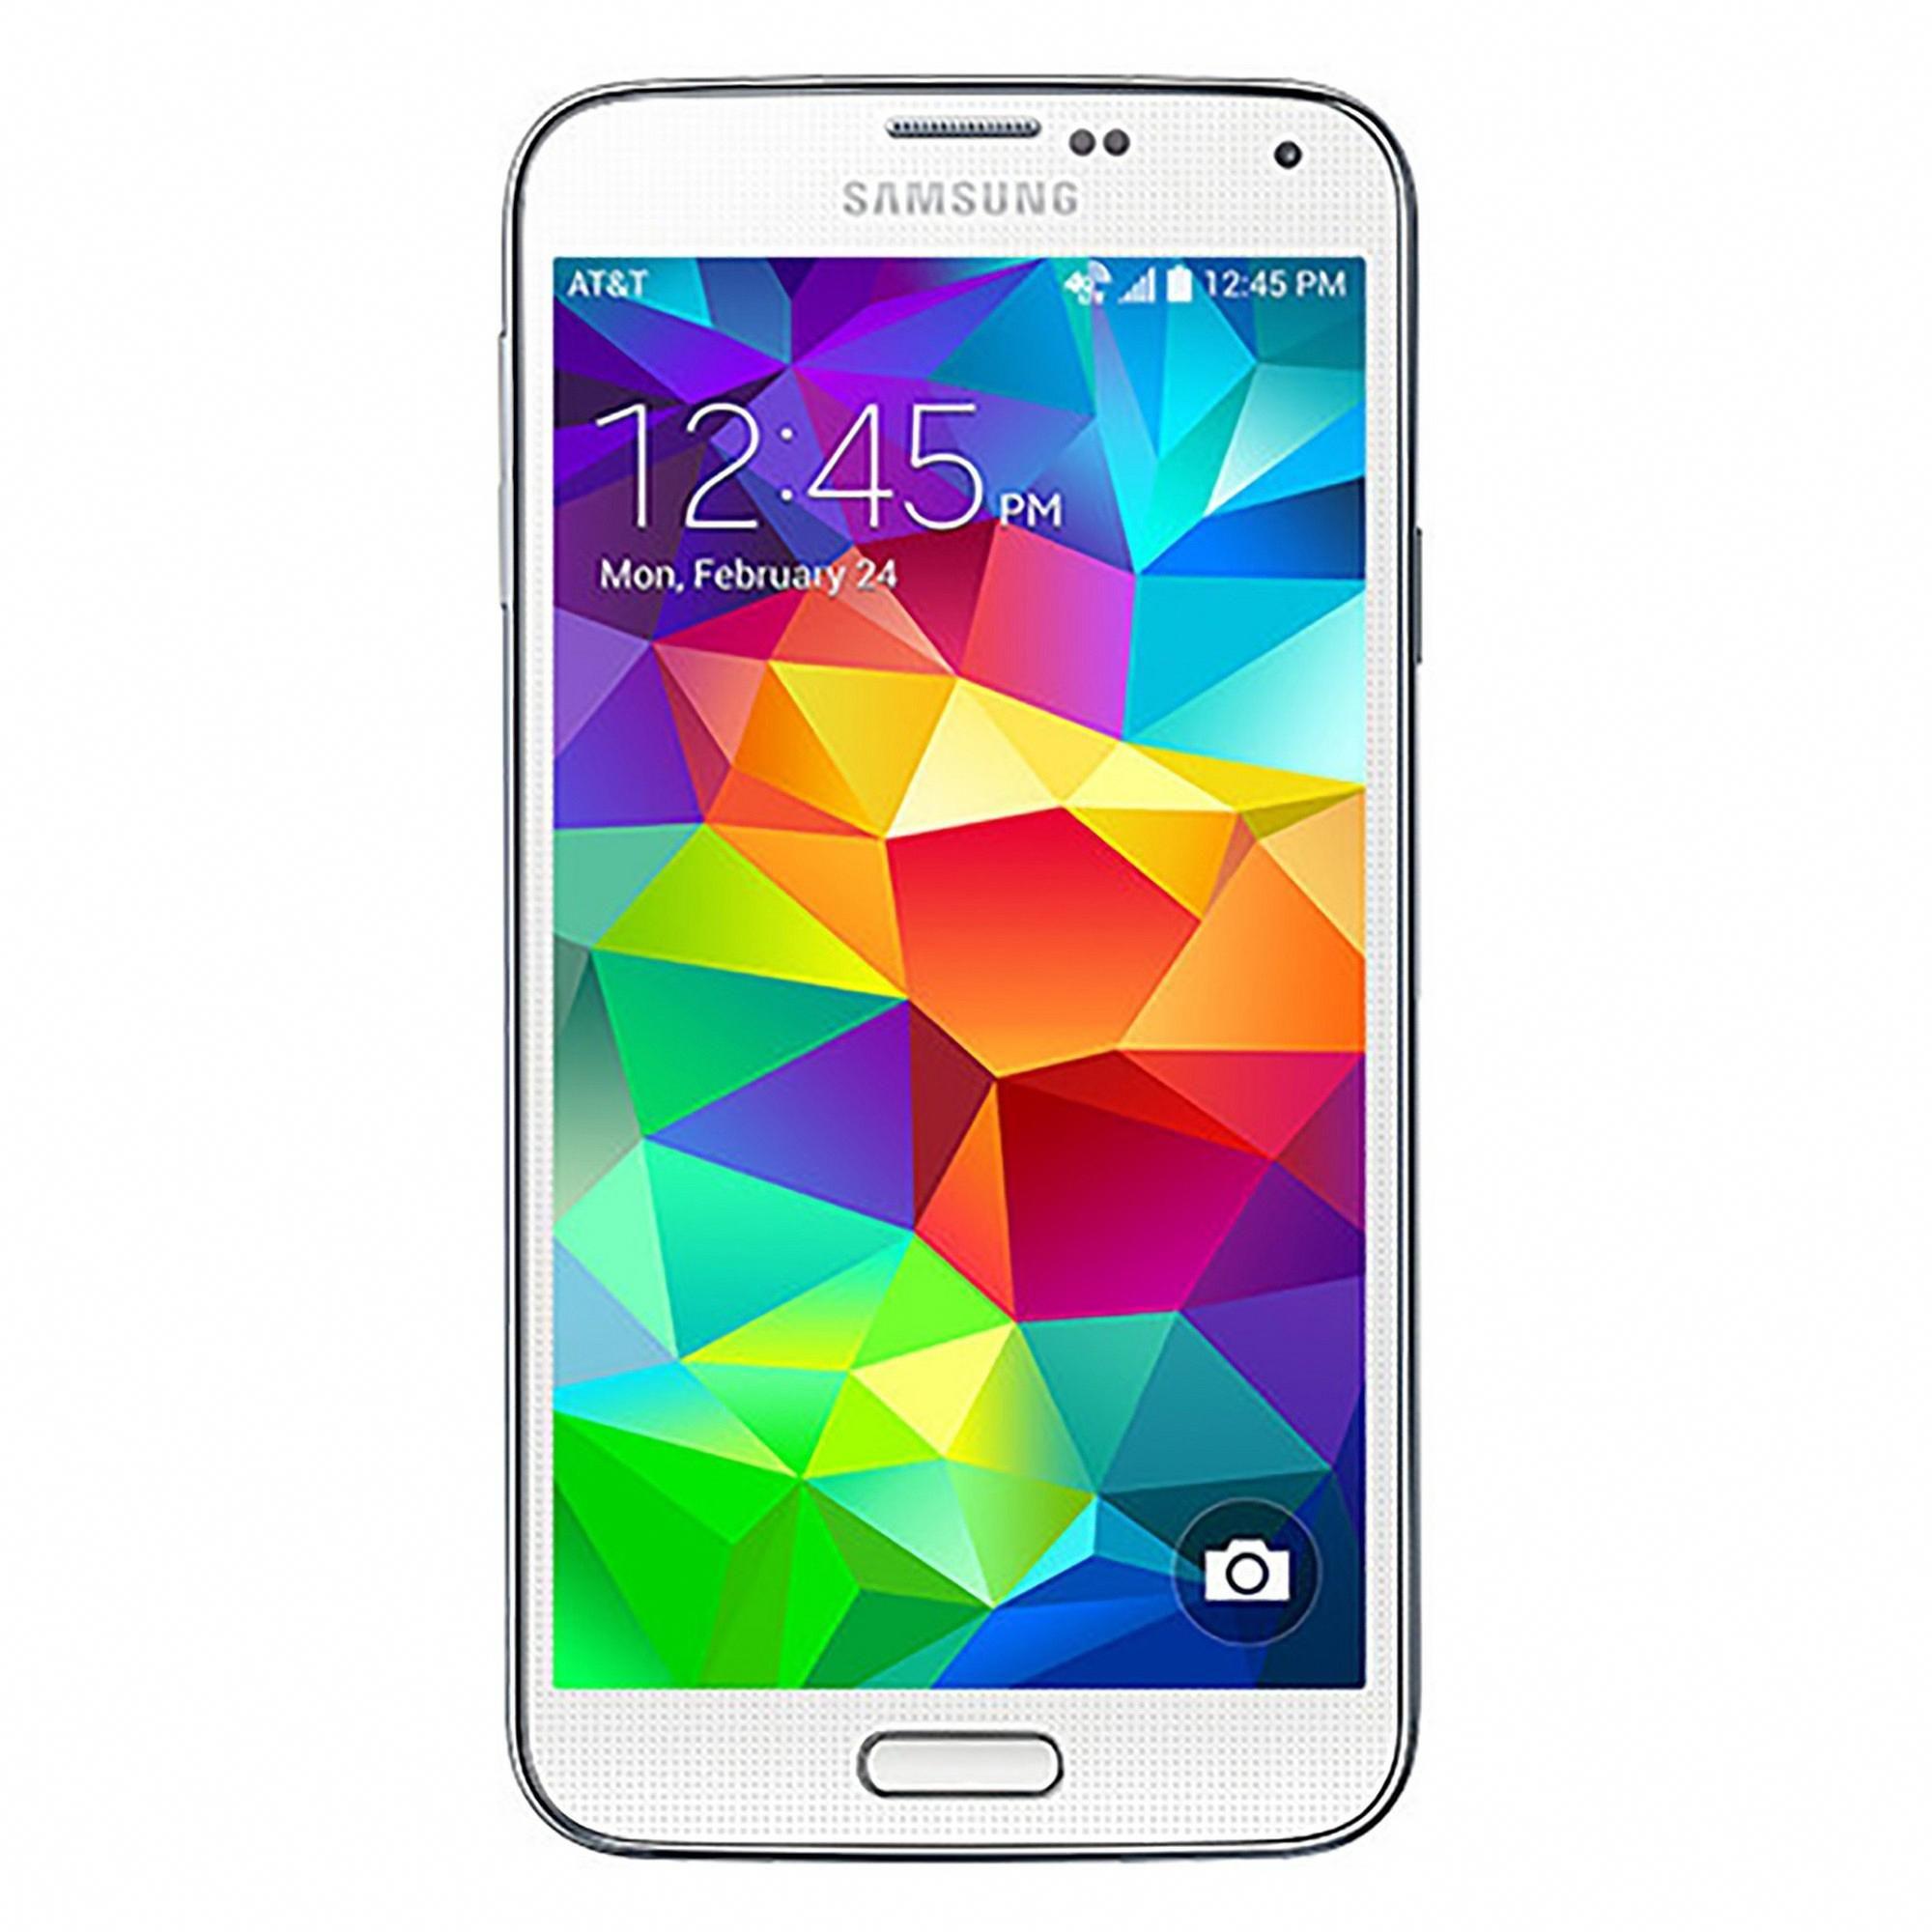 Samsung Galaxy S5 (Gsm Unlocked) 16GB Smartphone White